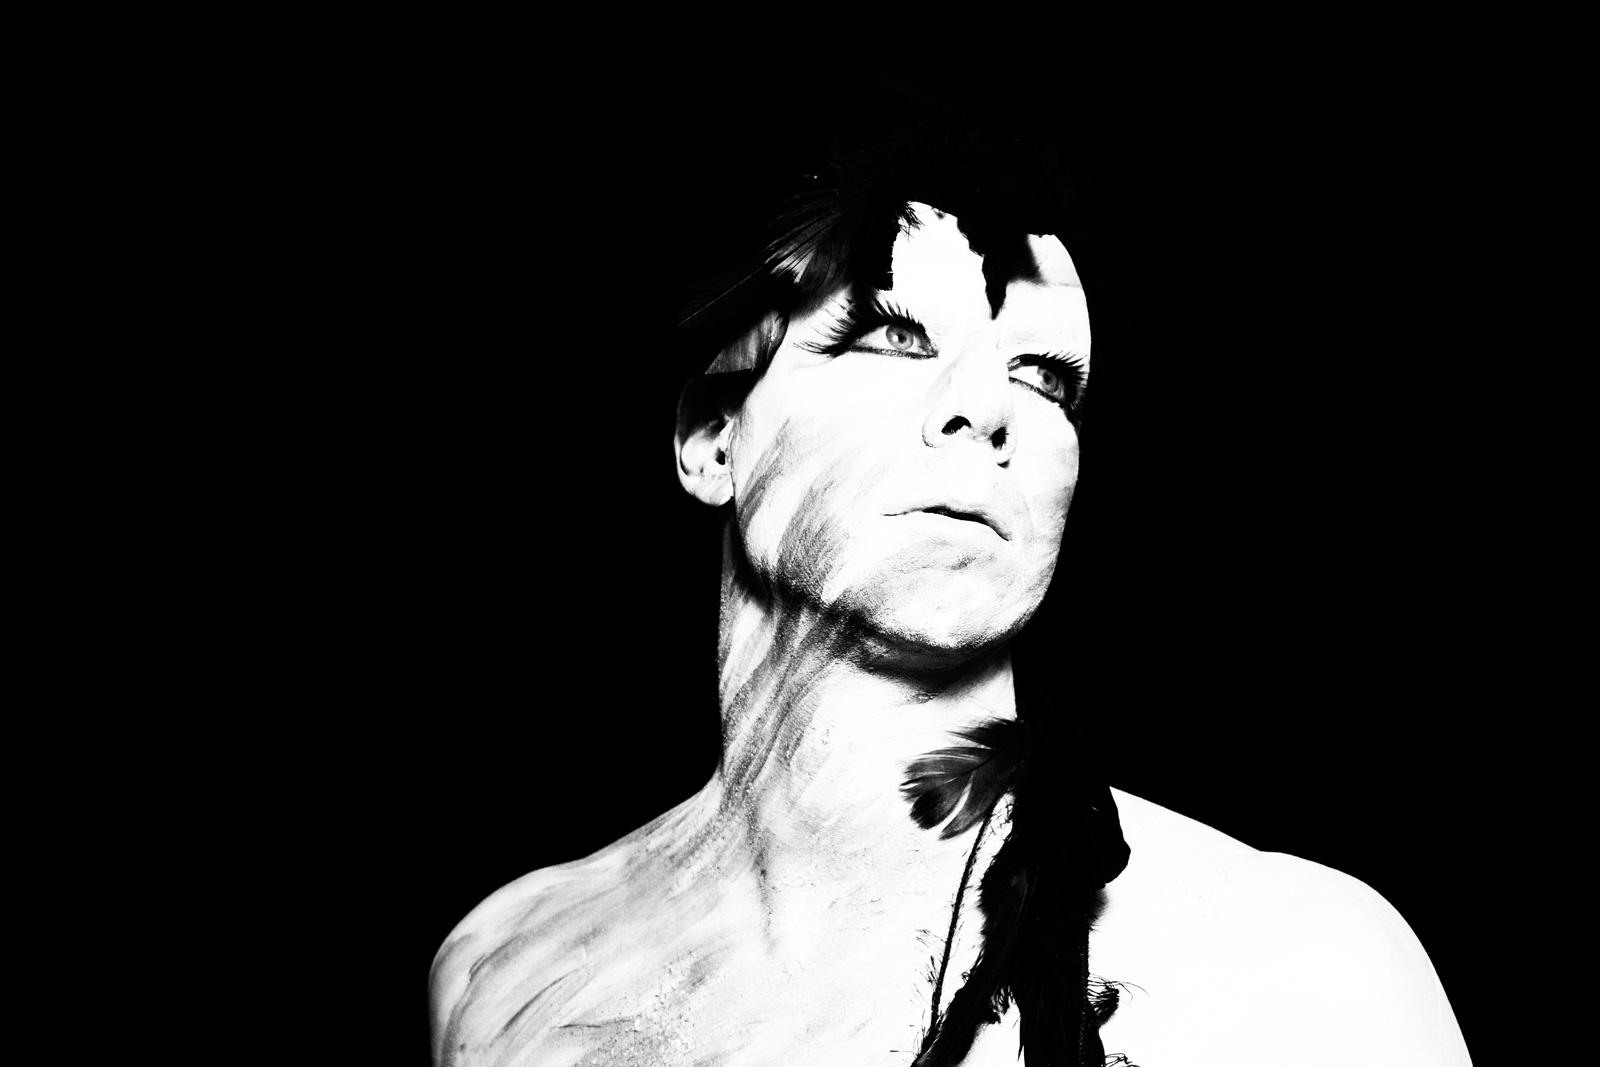 nr 1-Luminous-black and white photo-Michael